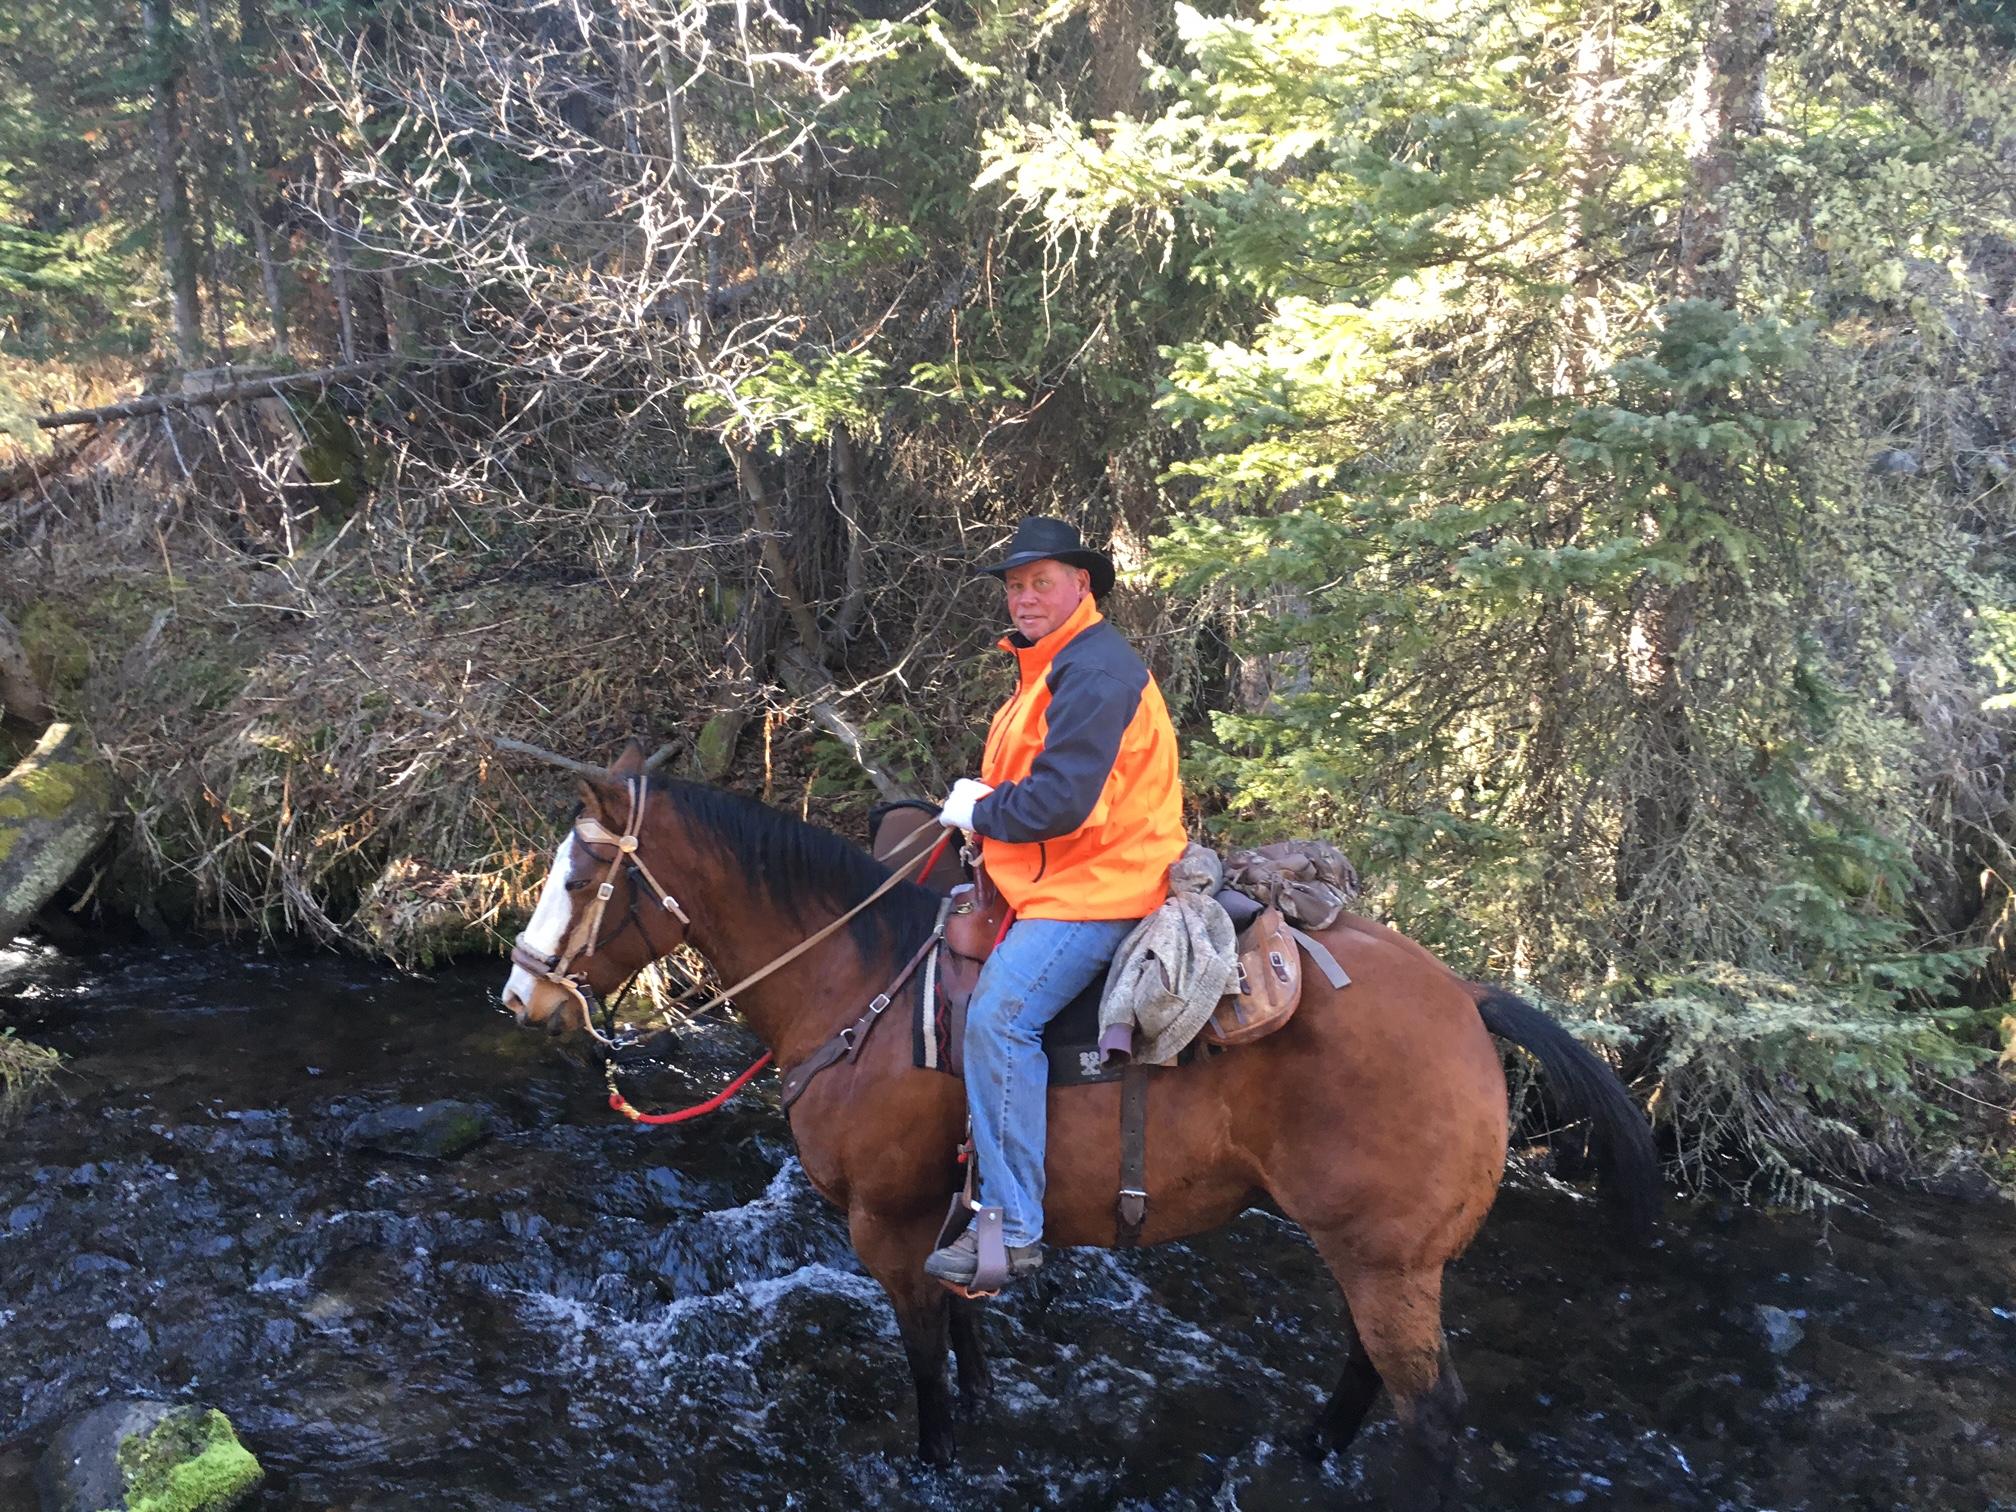 Returning from Elk Hunt